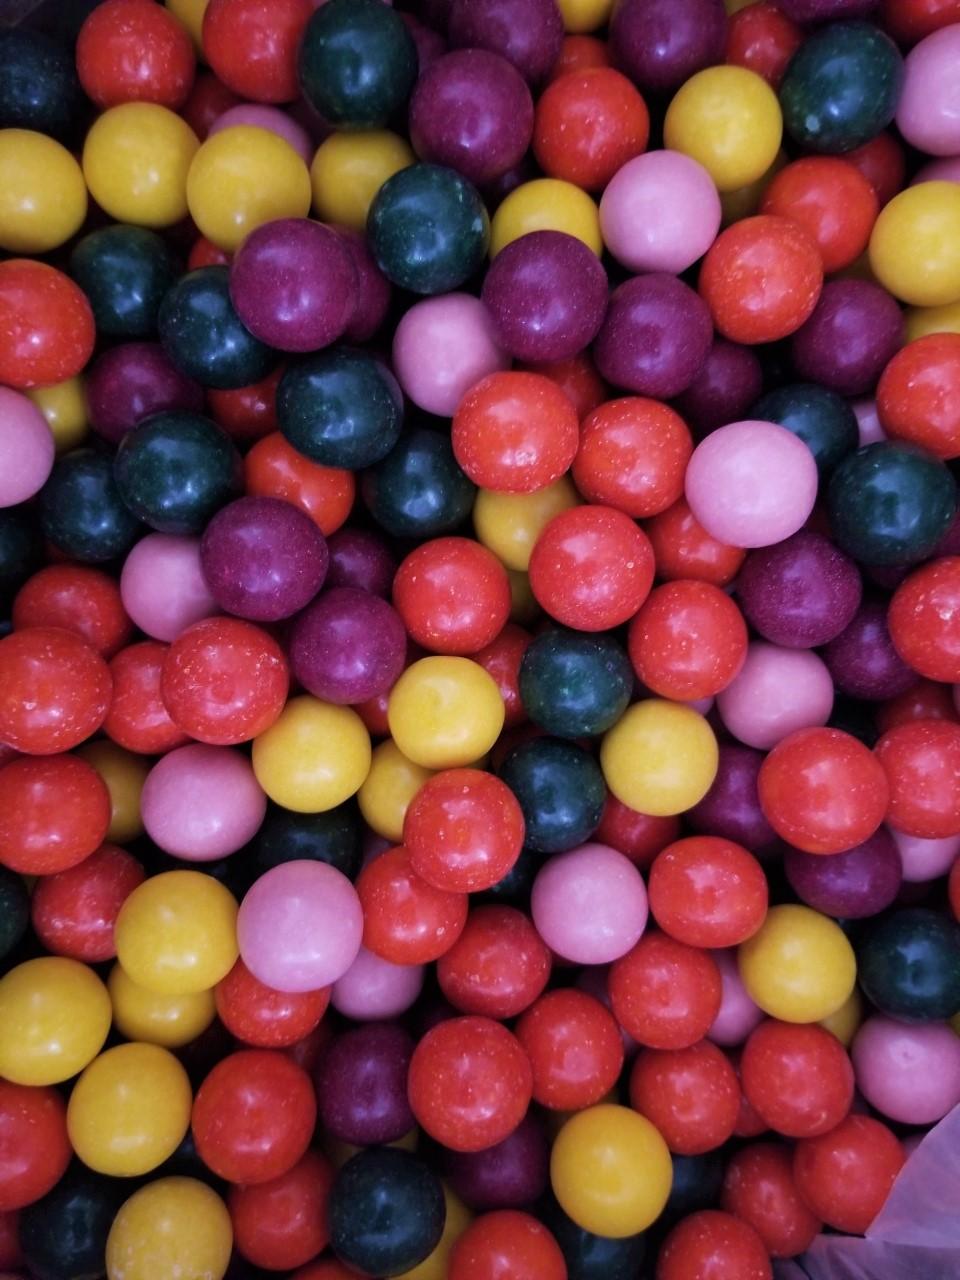 vegan gum, gumball candy